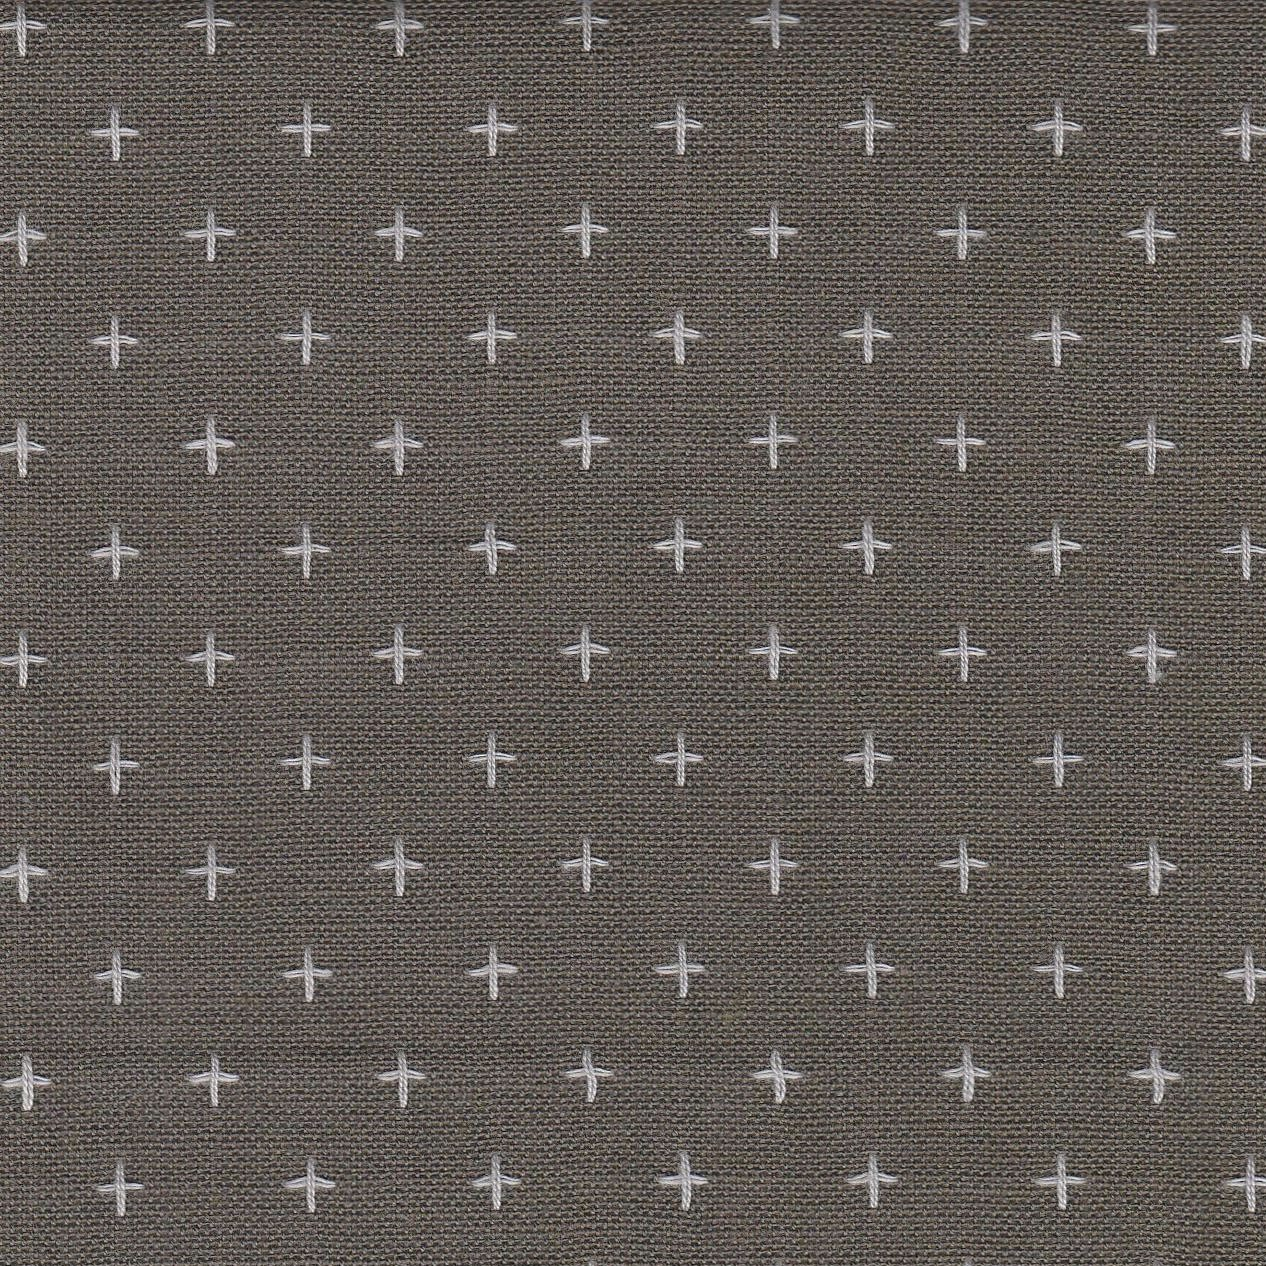 Diamond Textiles Manchester - Pluses and Crosses (Dark Grey)